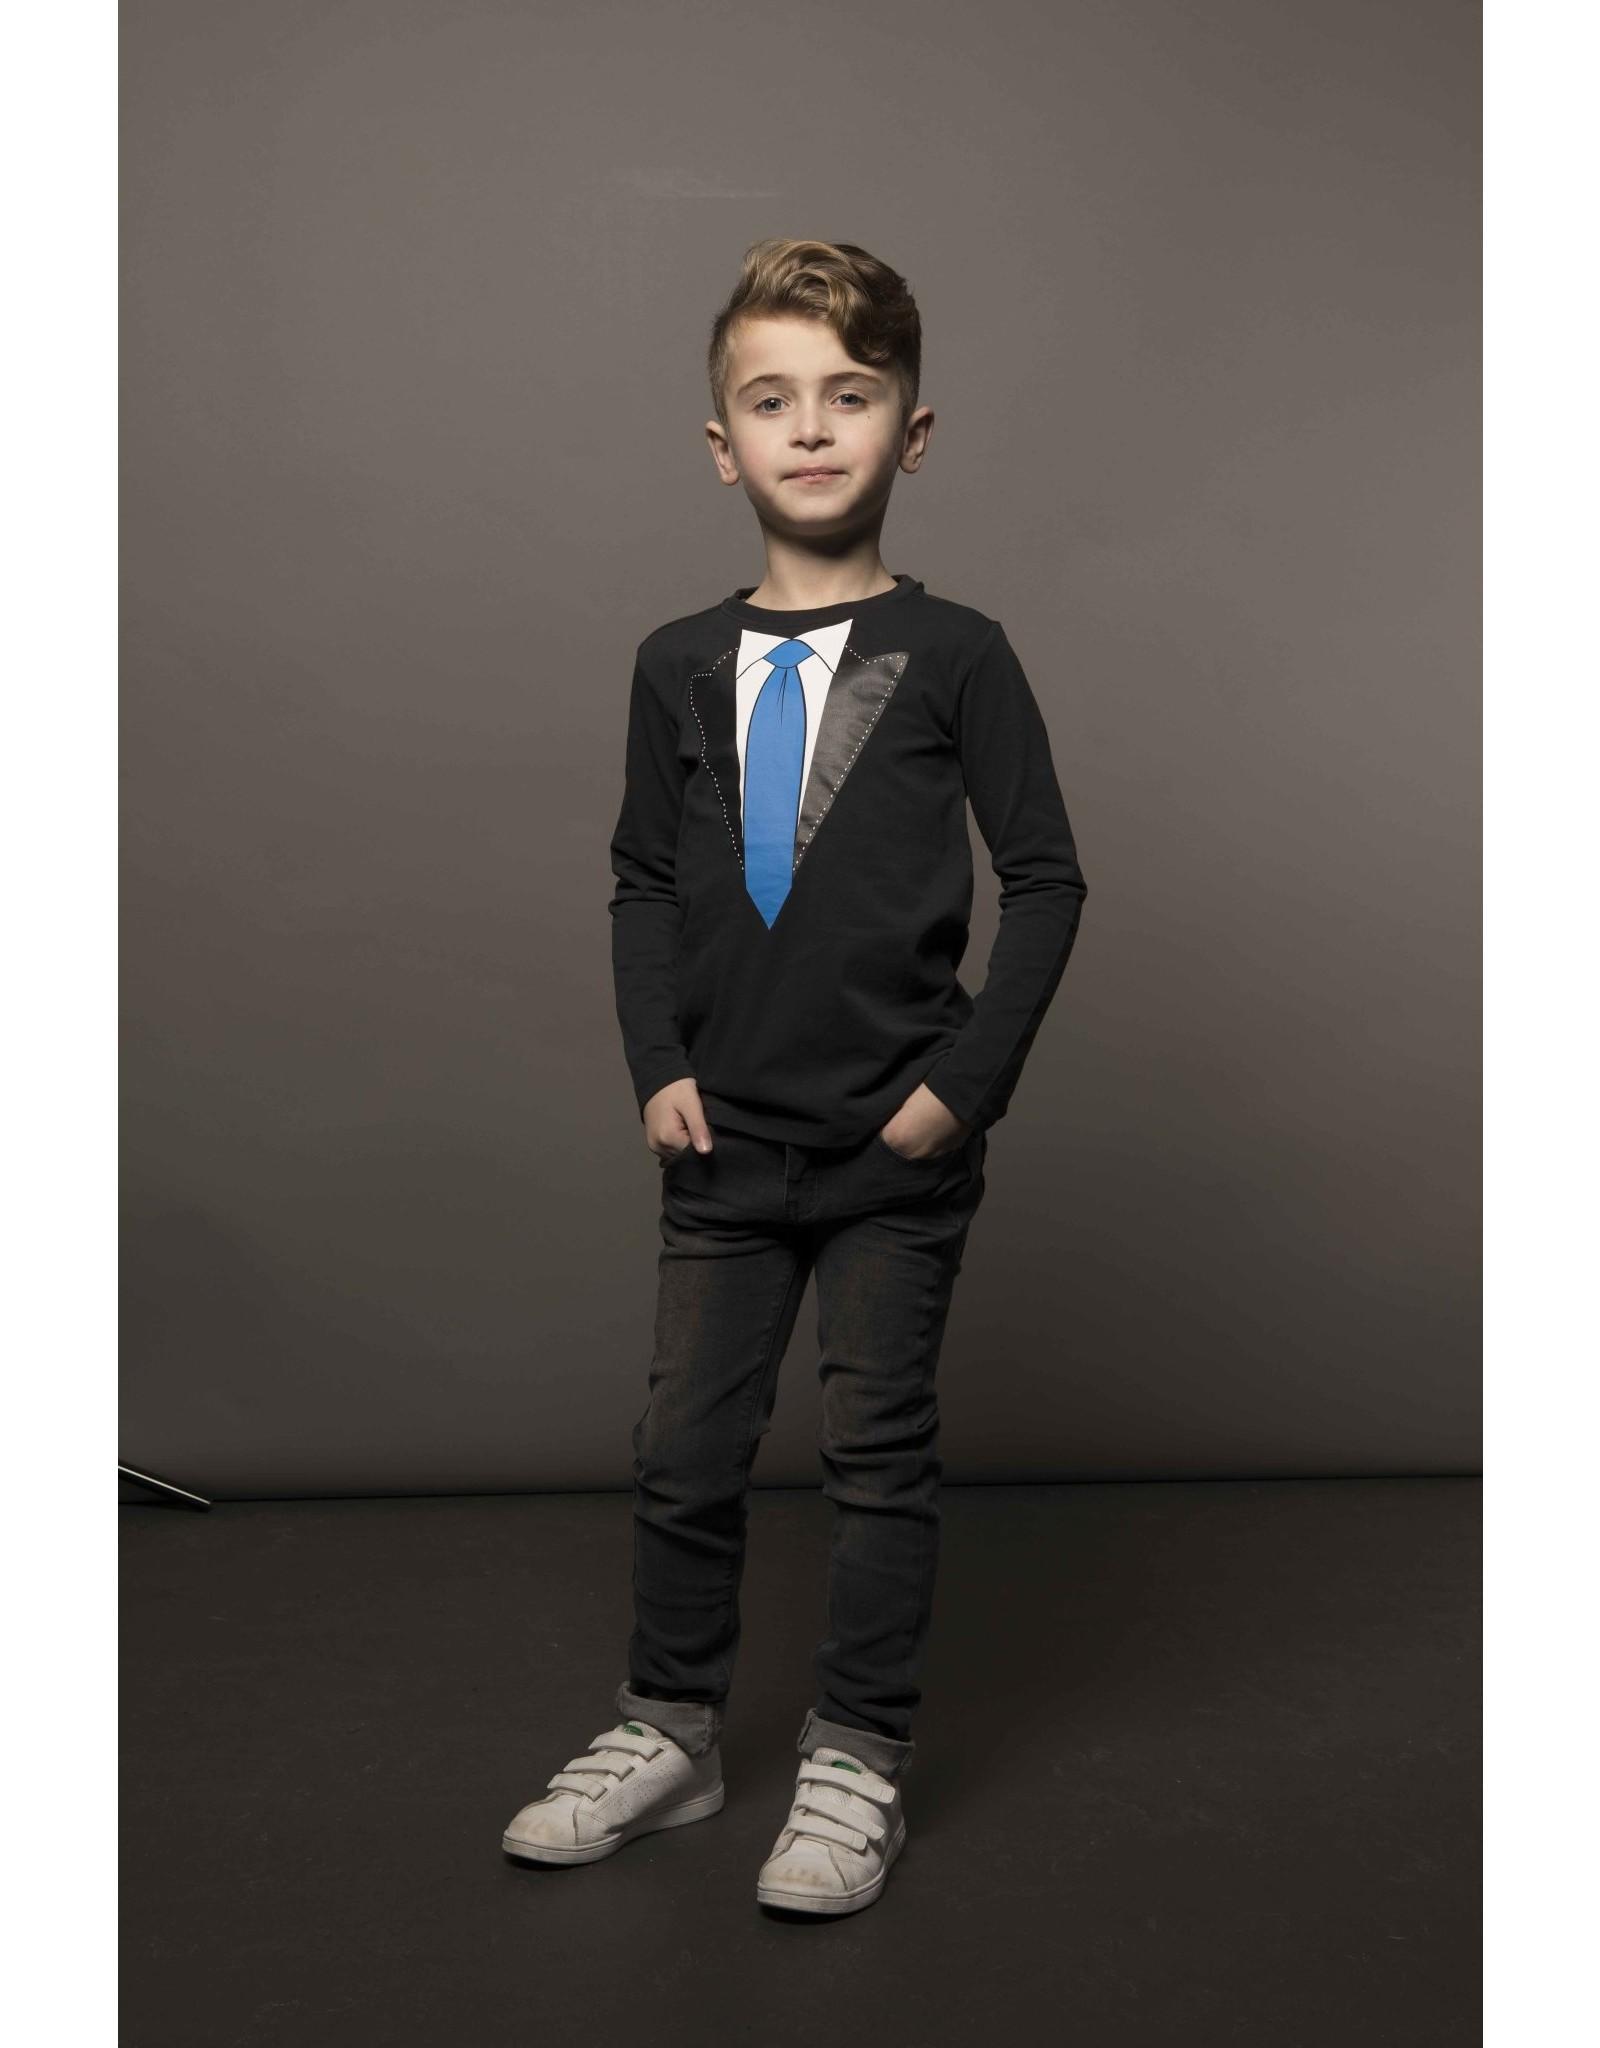 TYGO & vito TYGO & vito jongens shirt met stropdas